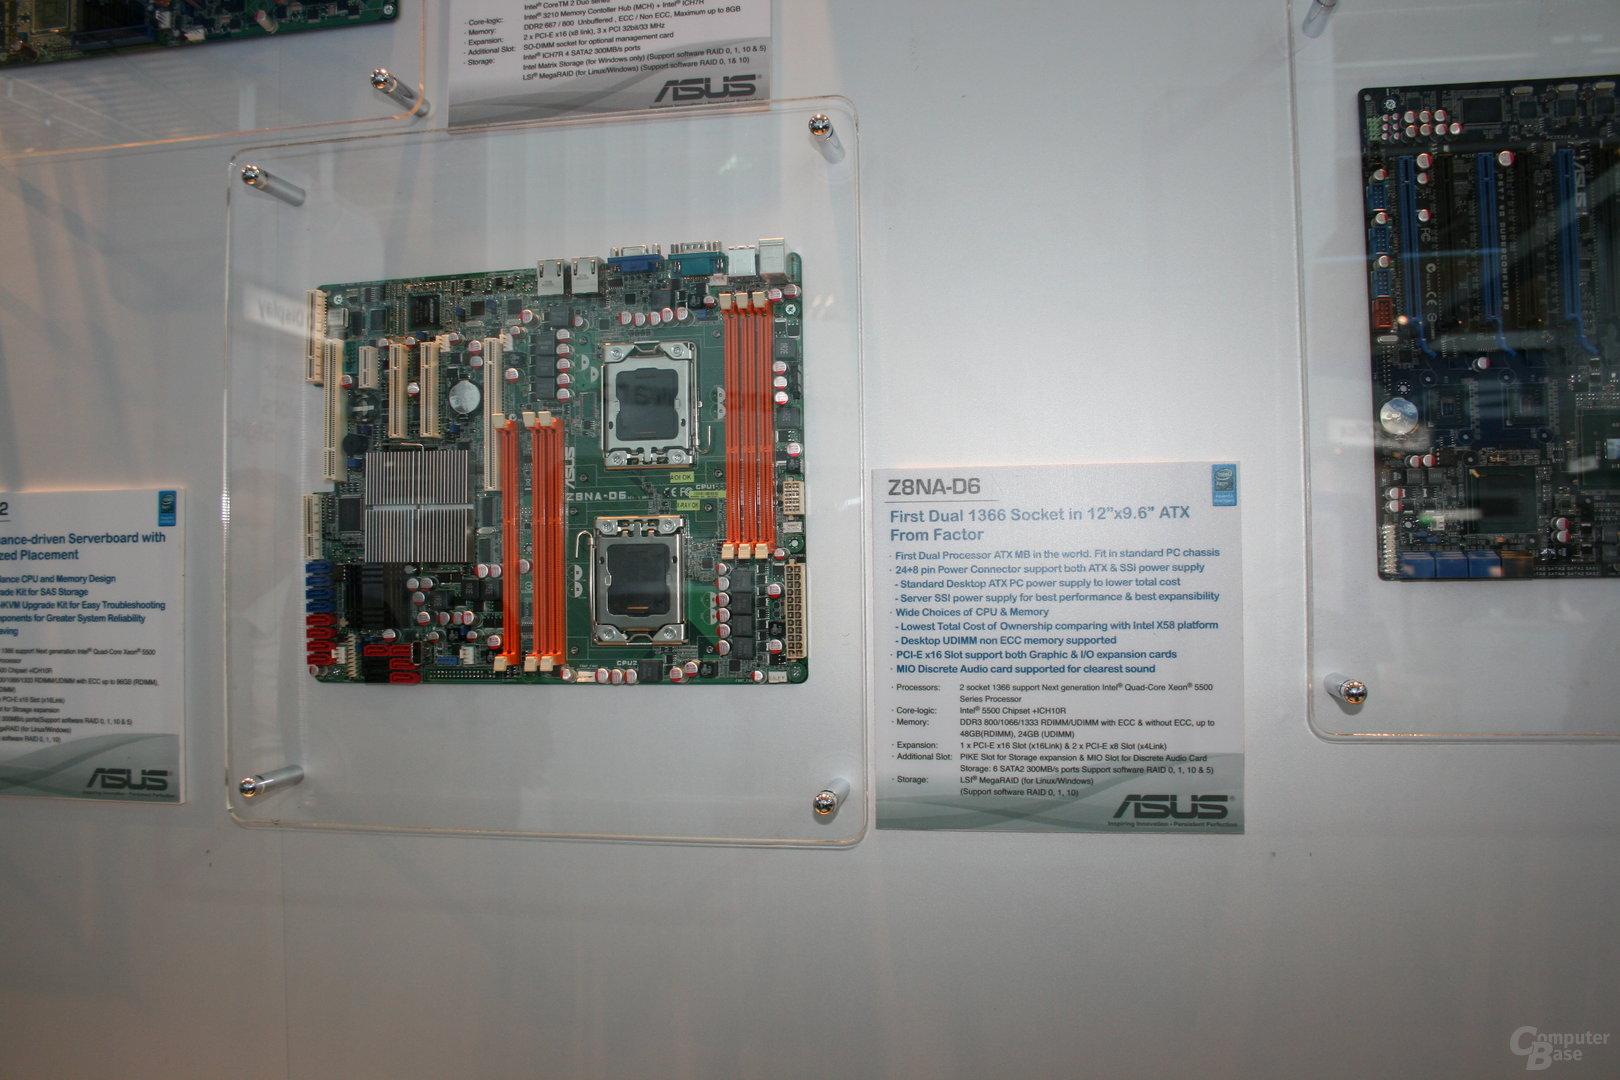 Asus Z8NA-D6